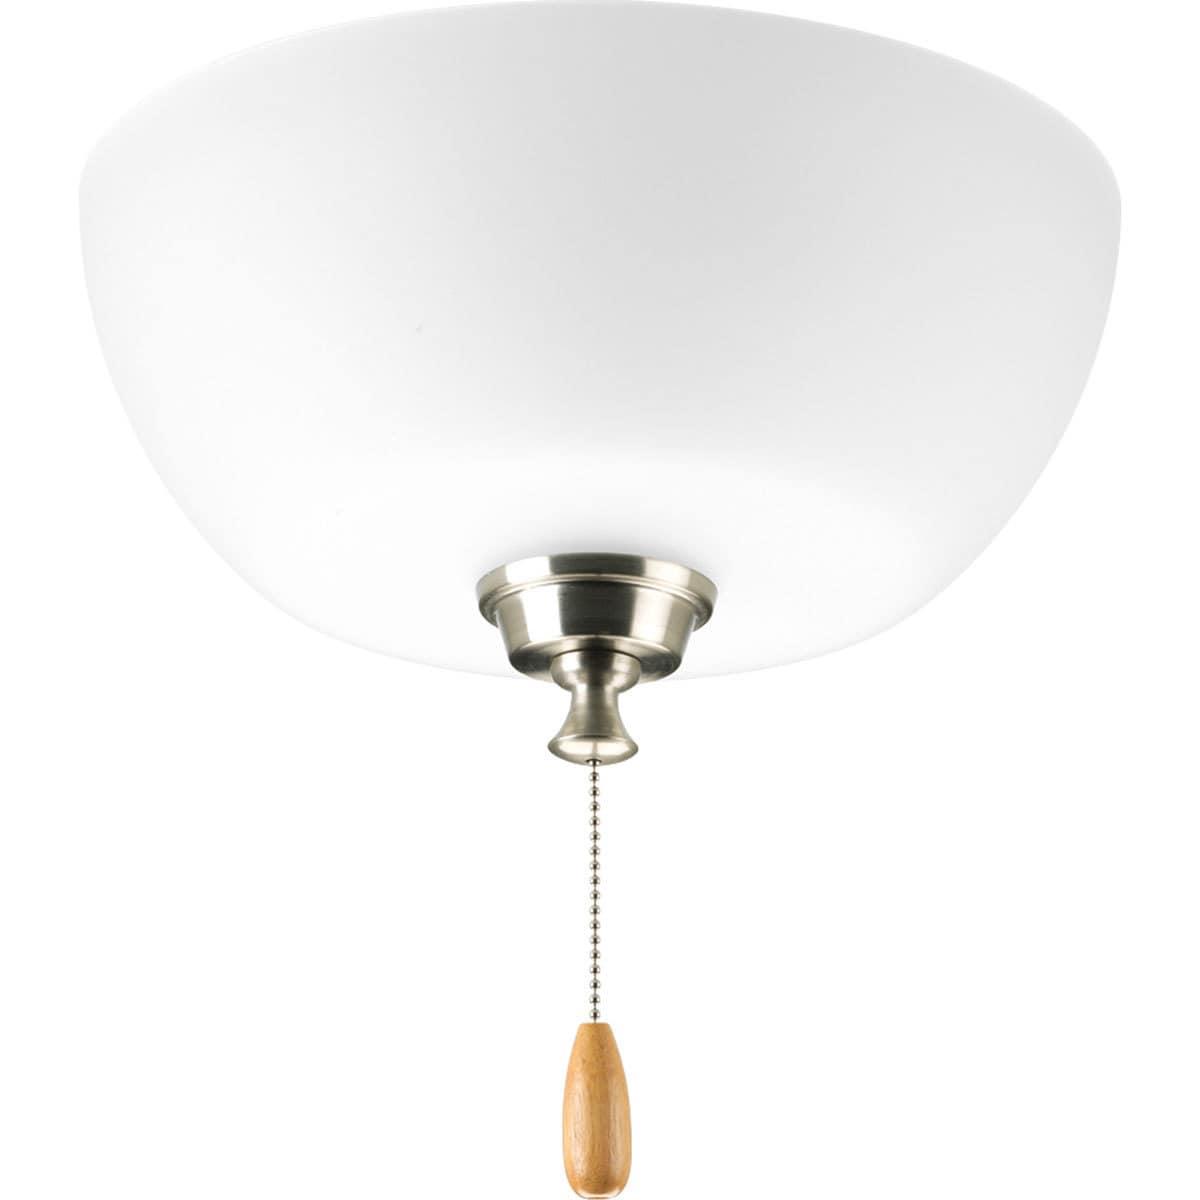 contemporary ceiling nickel ls glennis lite light loading zoom source brushed el ceilings lighting